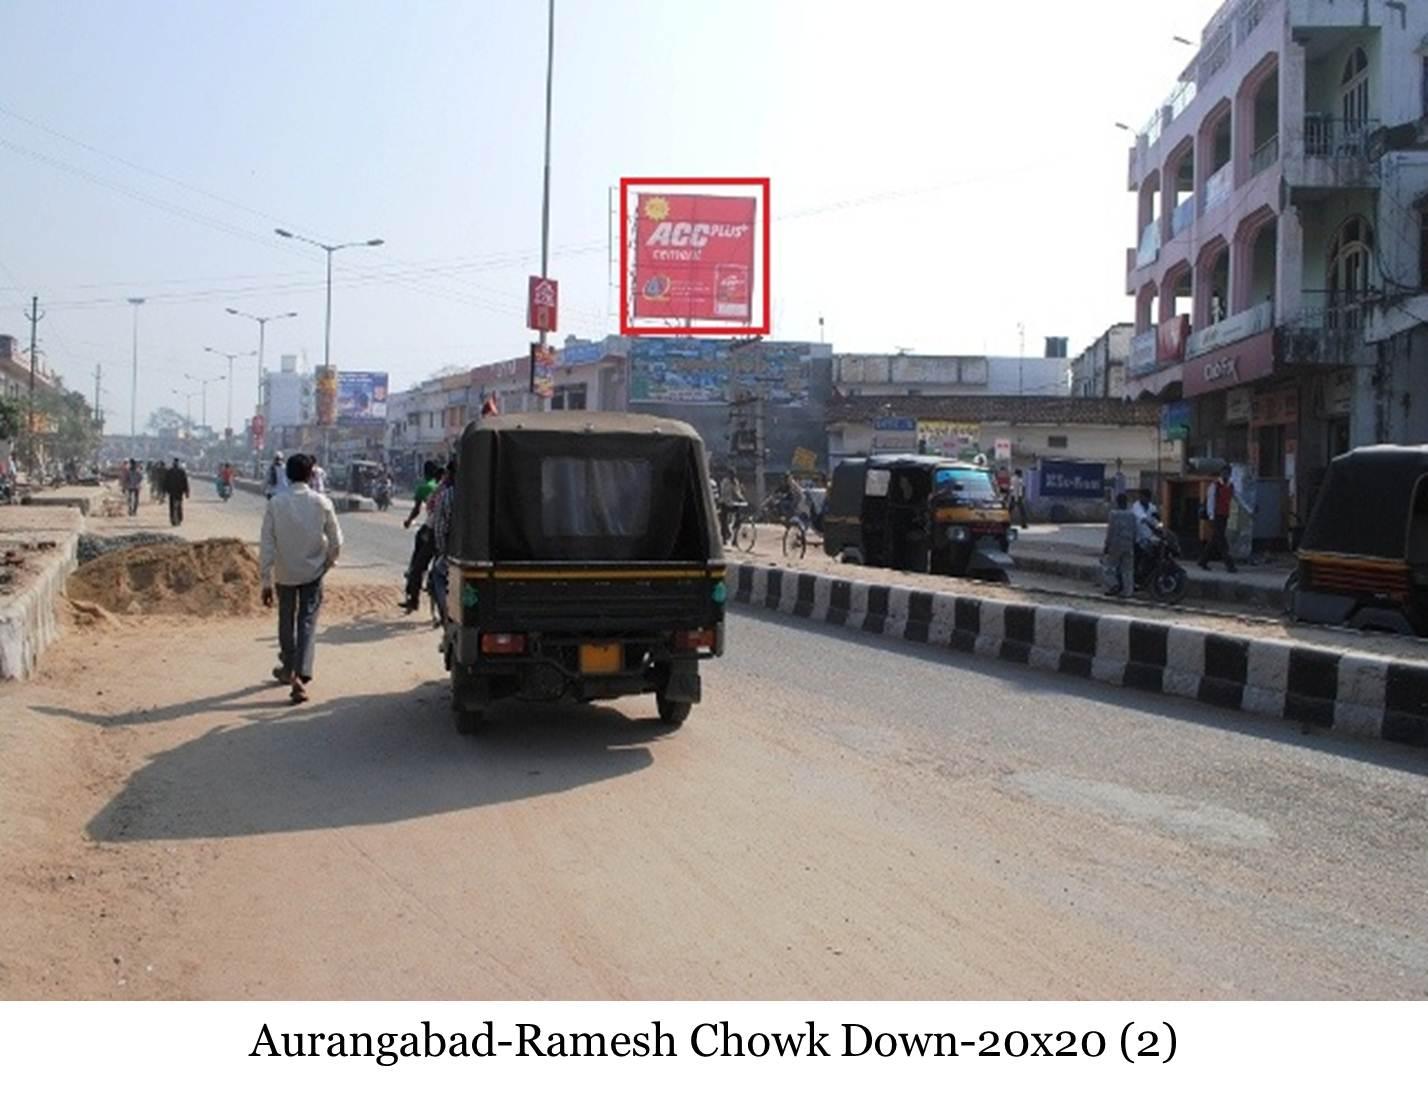 Ramesh Chowk Down, Aurangabad